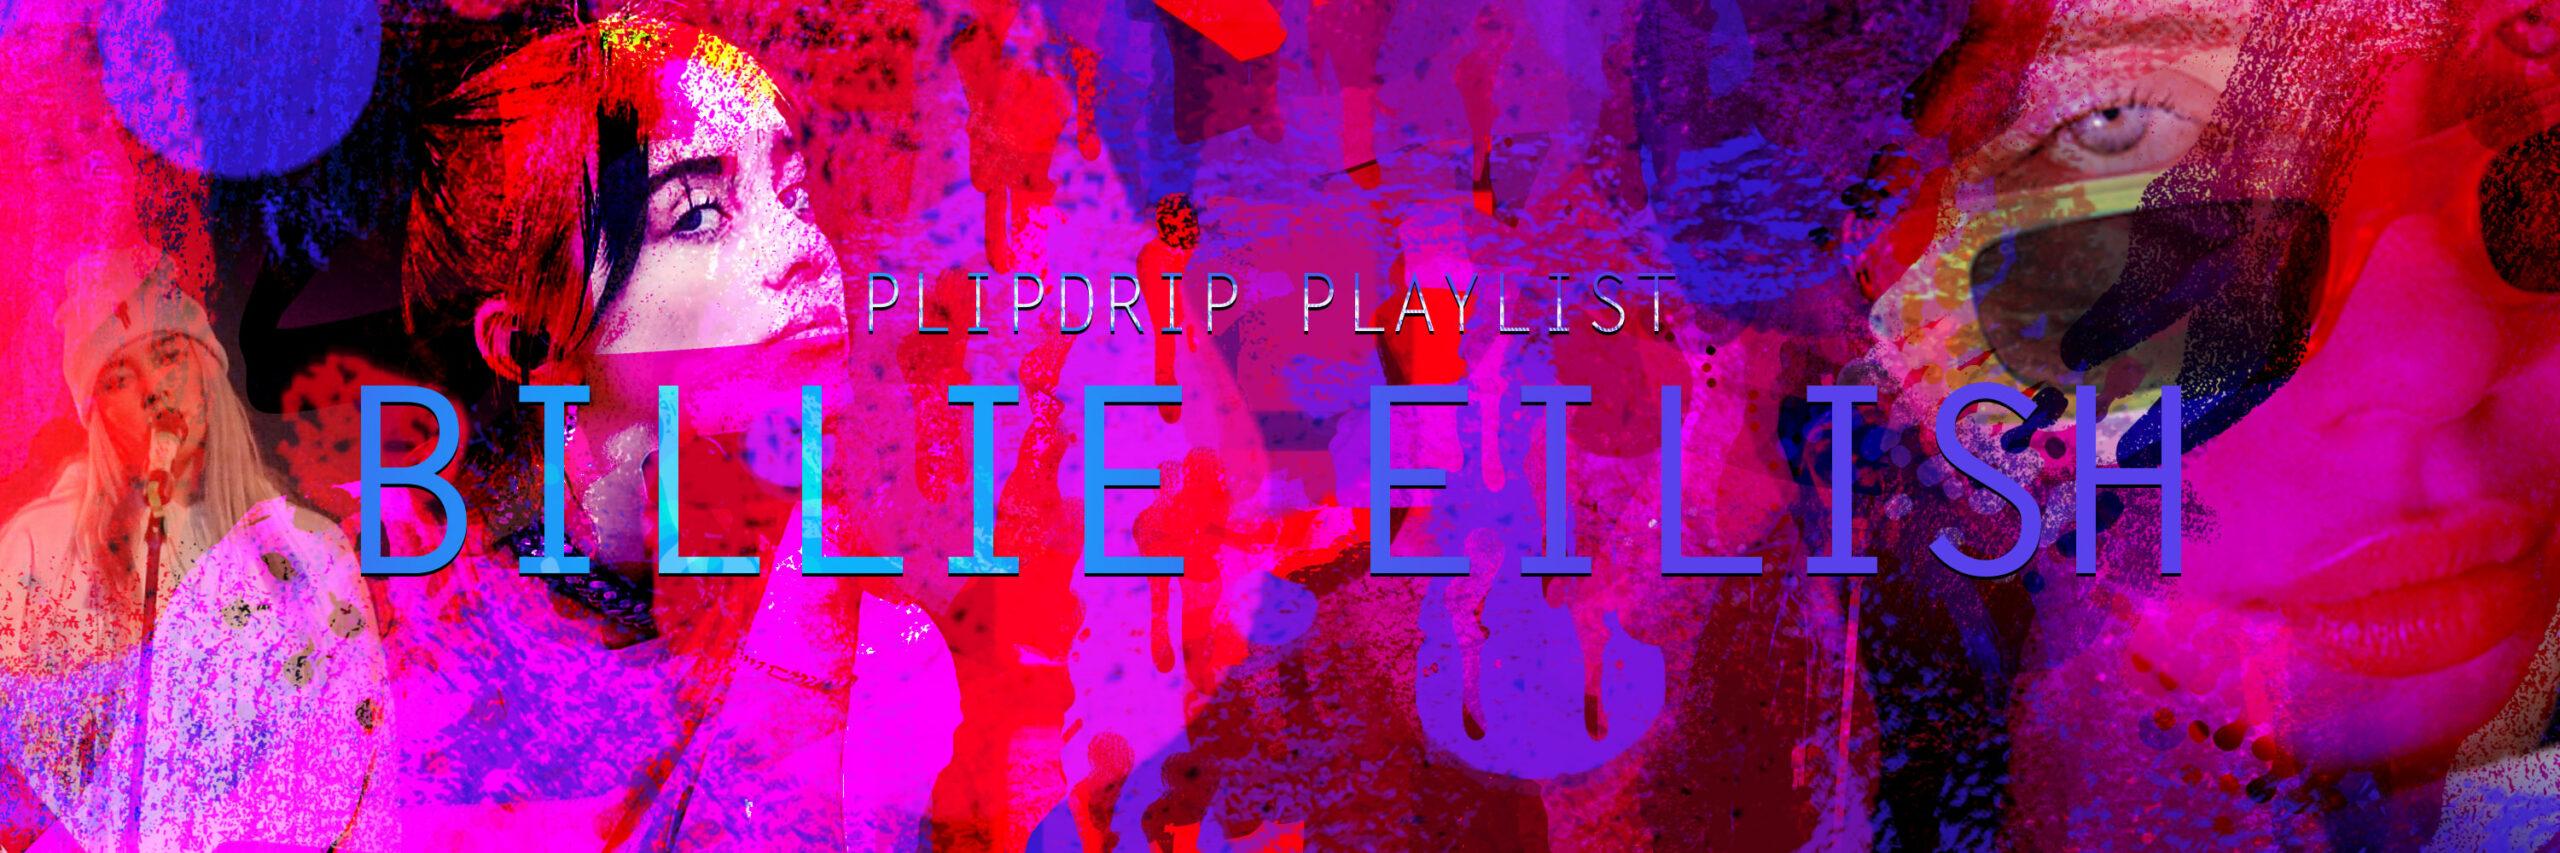 PF-billie-eilish-banner-1-copy